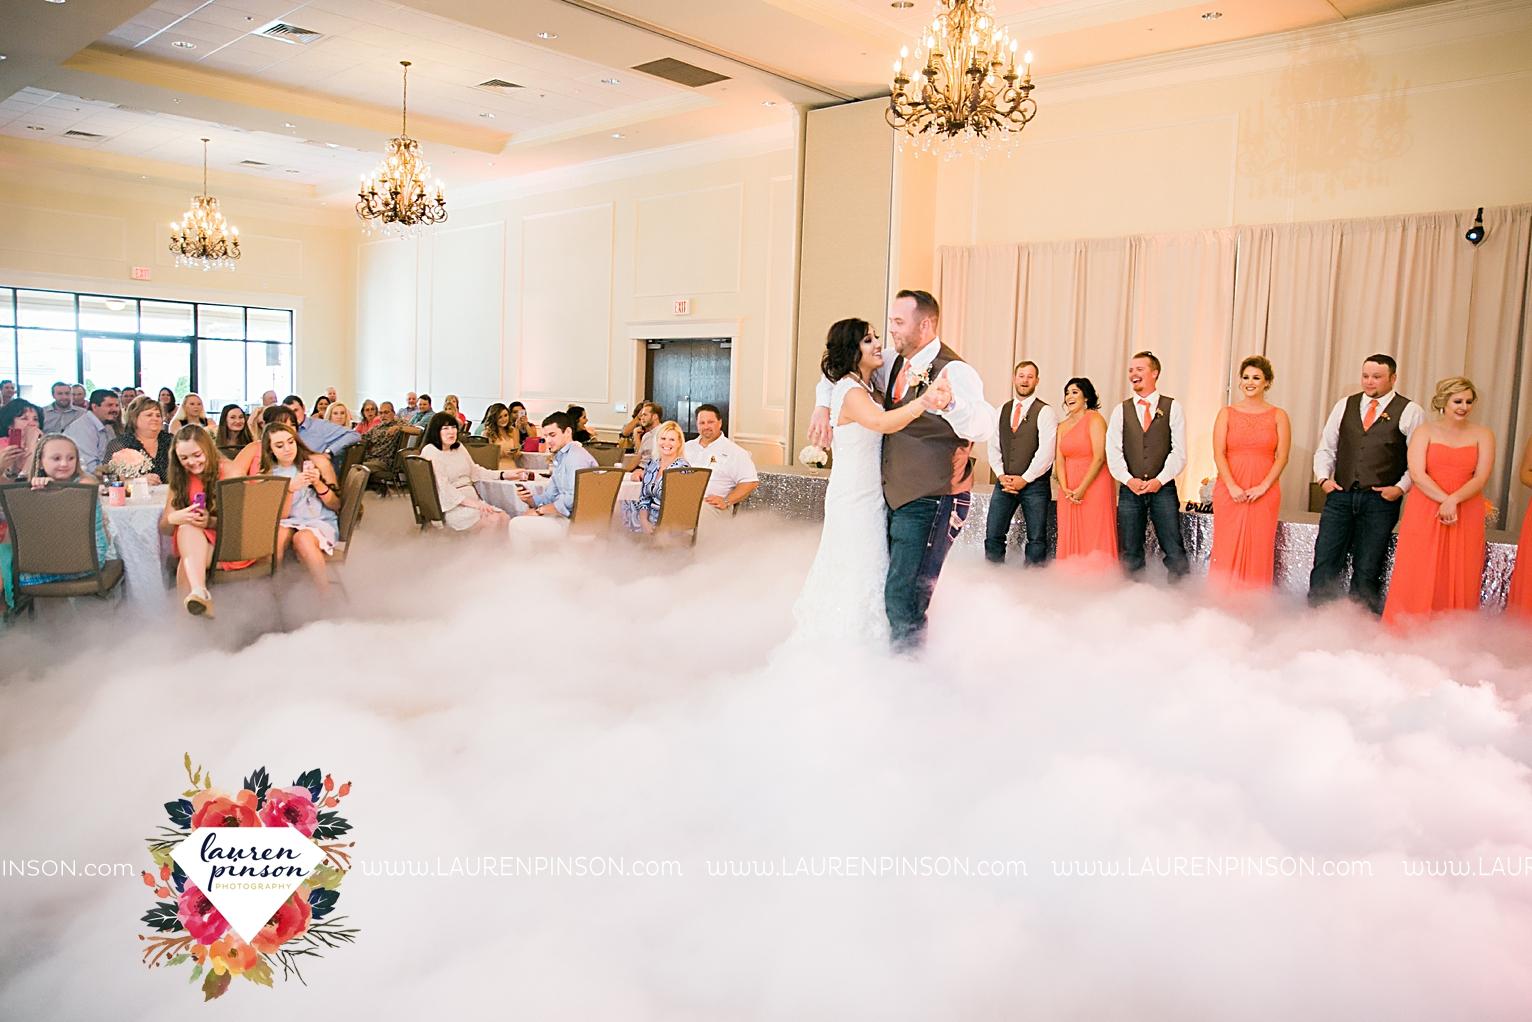 wichita-falls-texas-wedding-photographer-wellington-on-the-lake-with-mayfield-events_2987.jpg